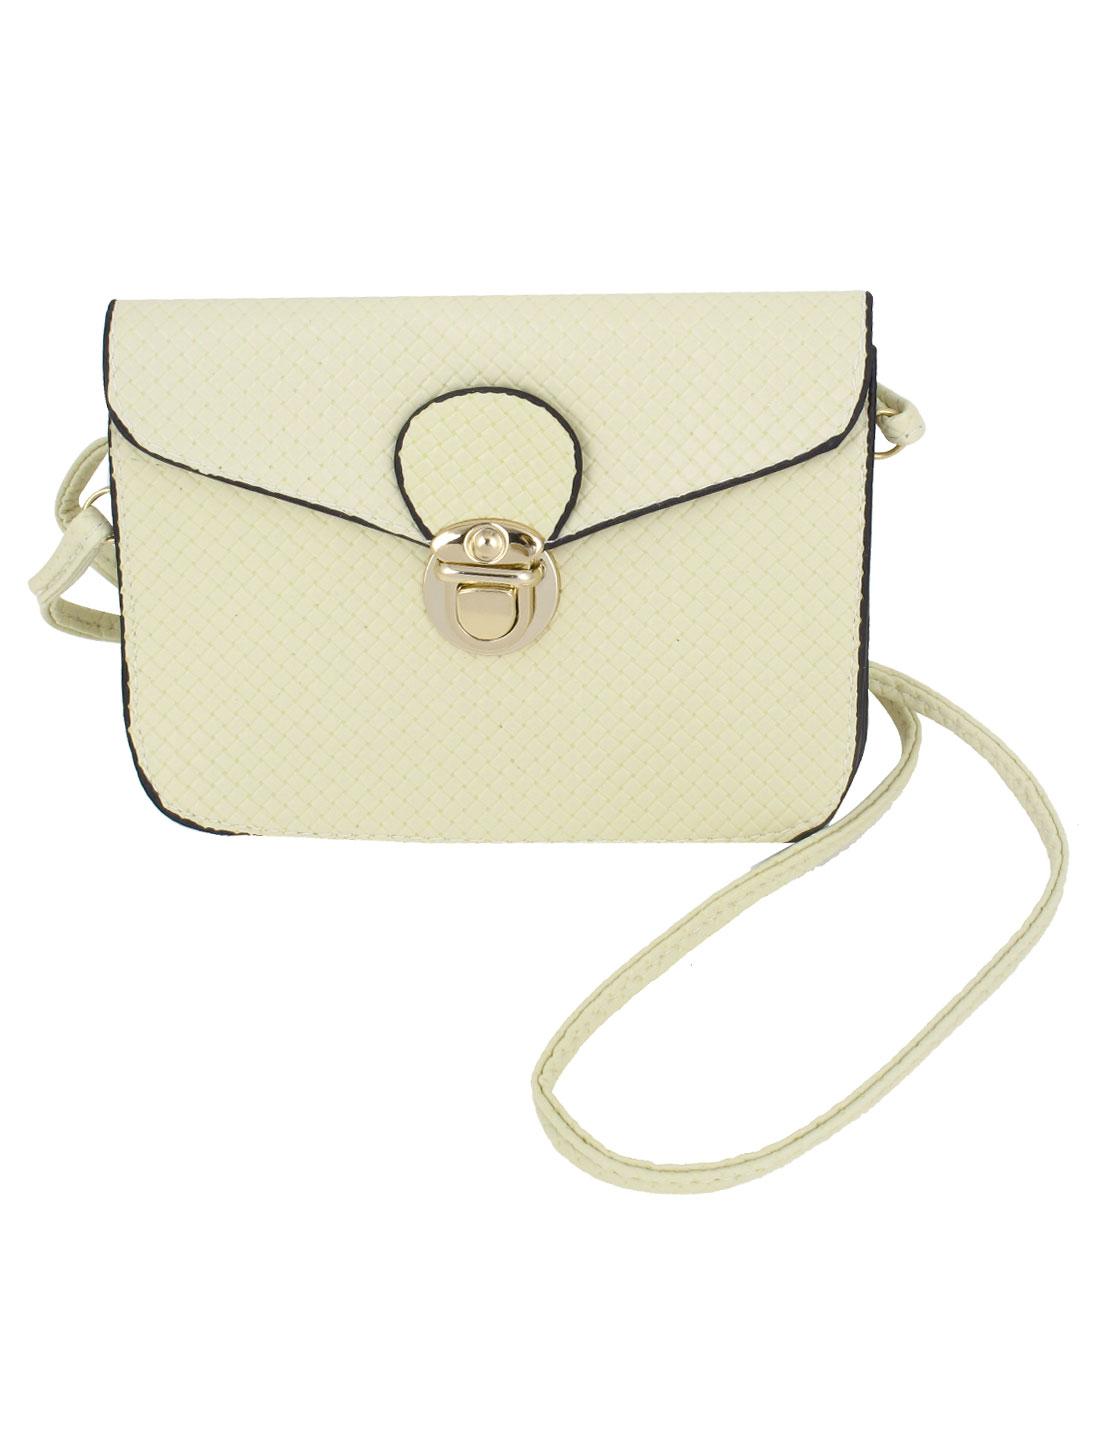 Lady Faux Leather Push Lock Closure Woven Pattern Crossbody Shoulder Bag Beige